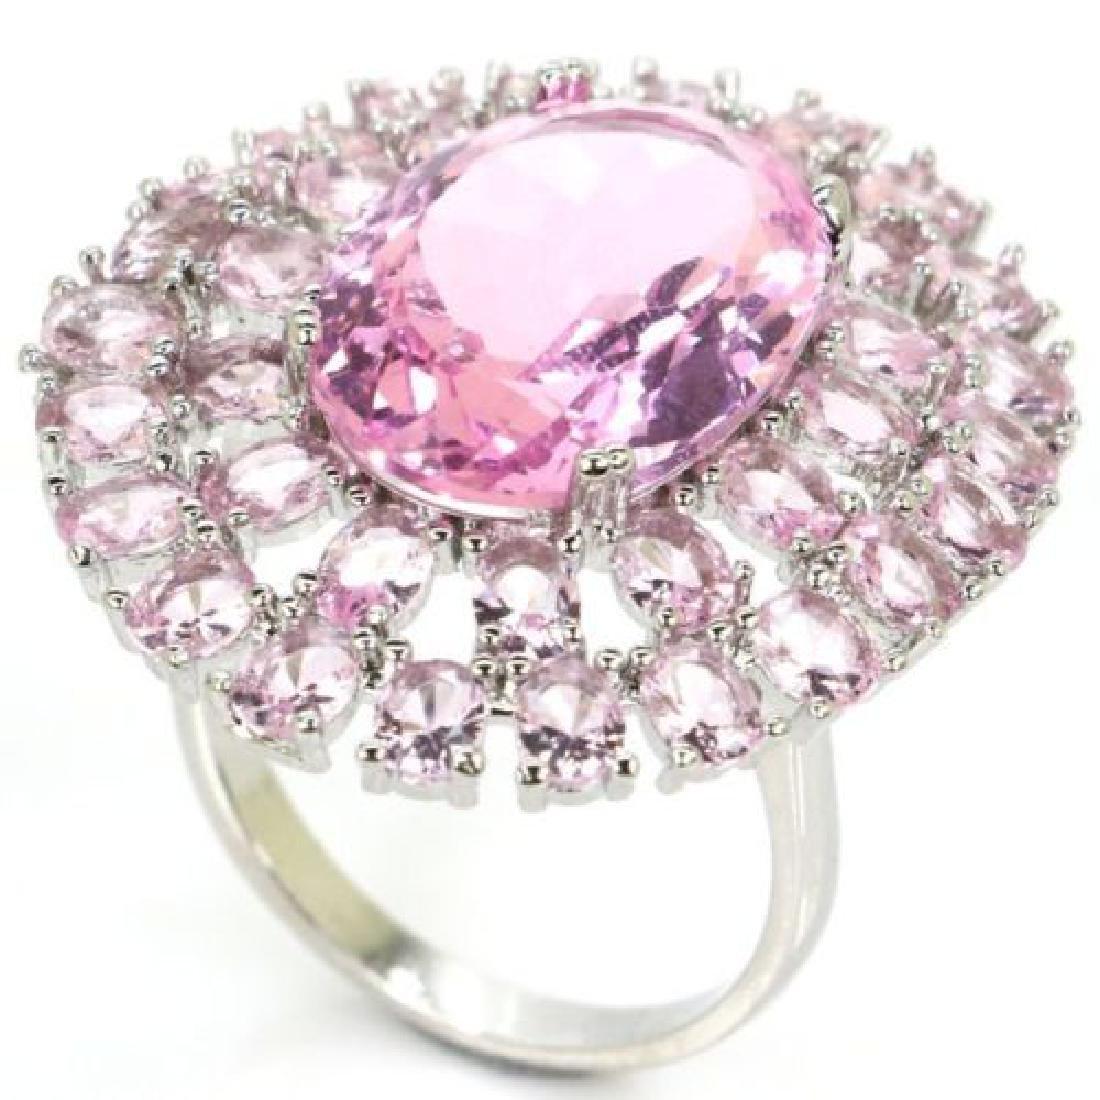 Pink Kunzite, Silver Ring Us sz8.5 - 2